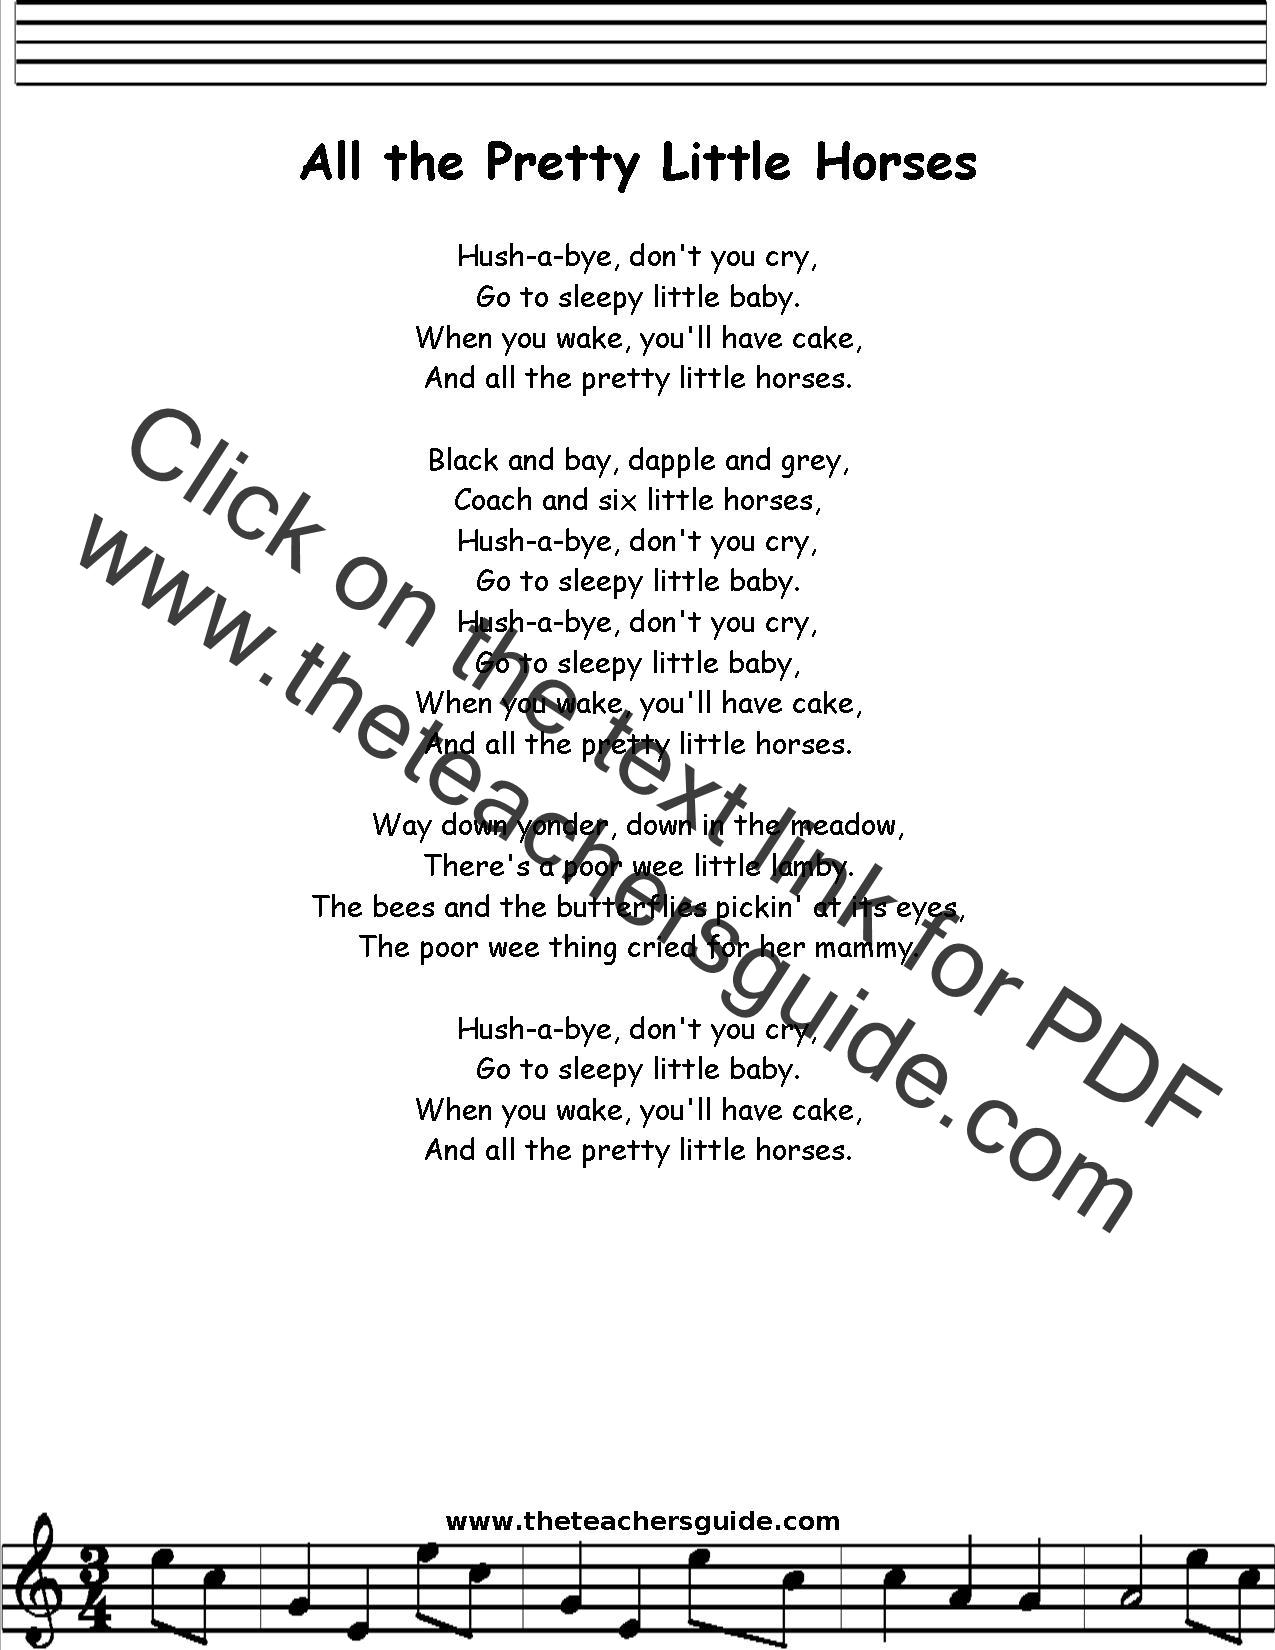 All The Pretty Little Horses Lyrics Printout Midi And Video